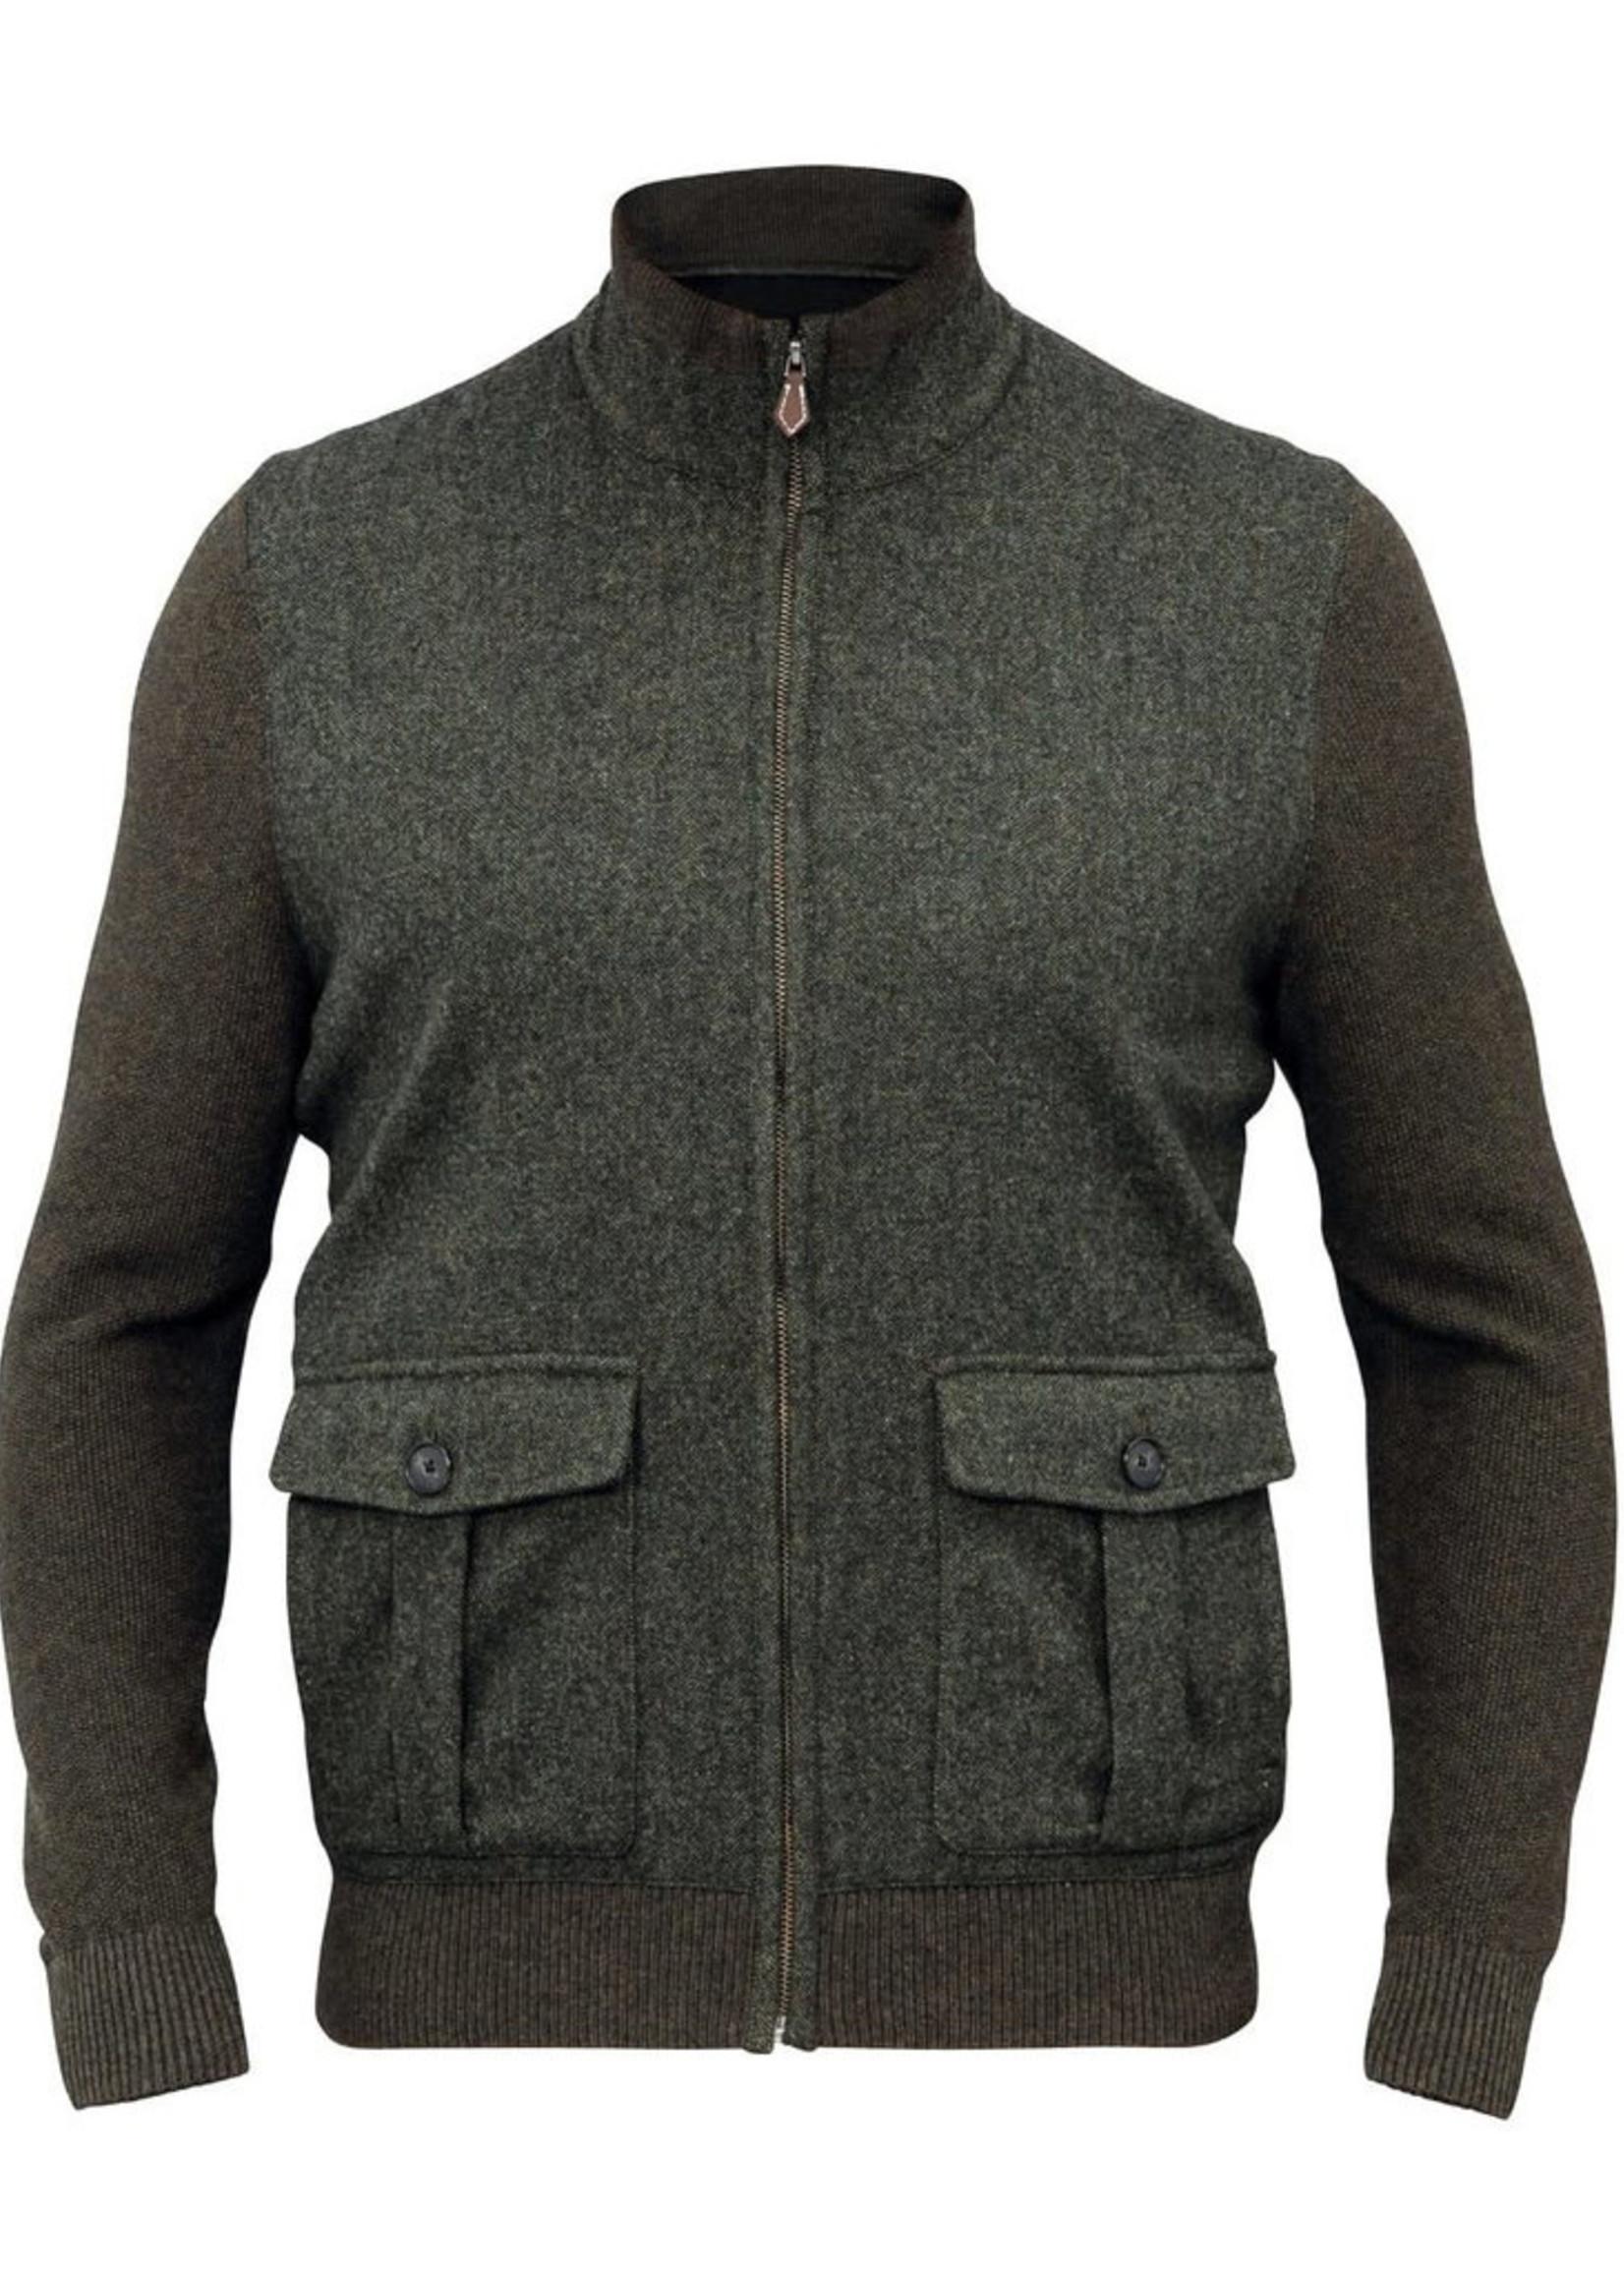 Alan Paine Thursford Loden Merino/Tweed Zip Mock Sweater  by Alan Paine